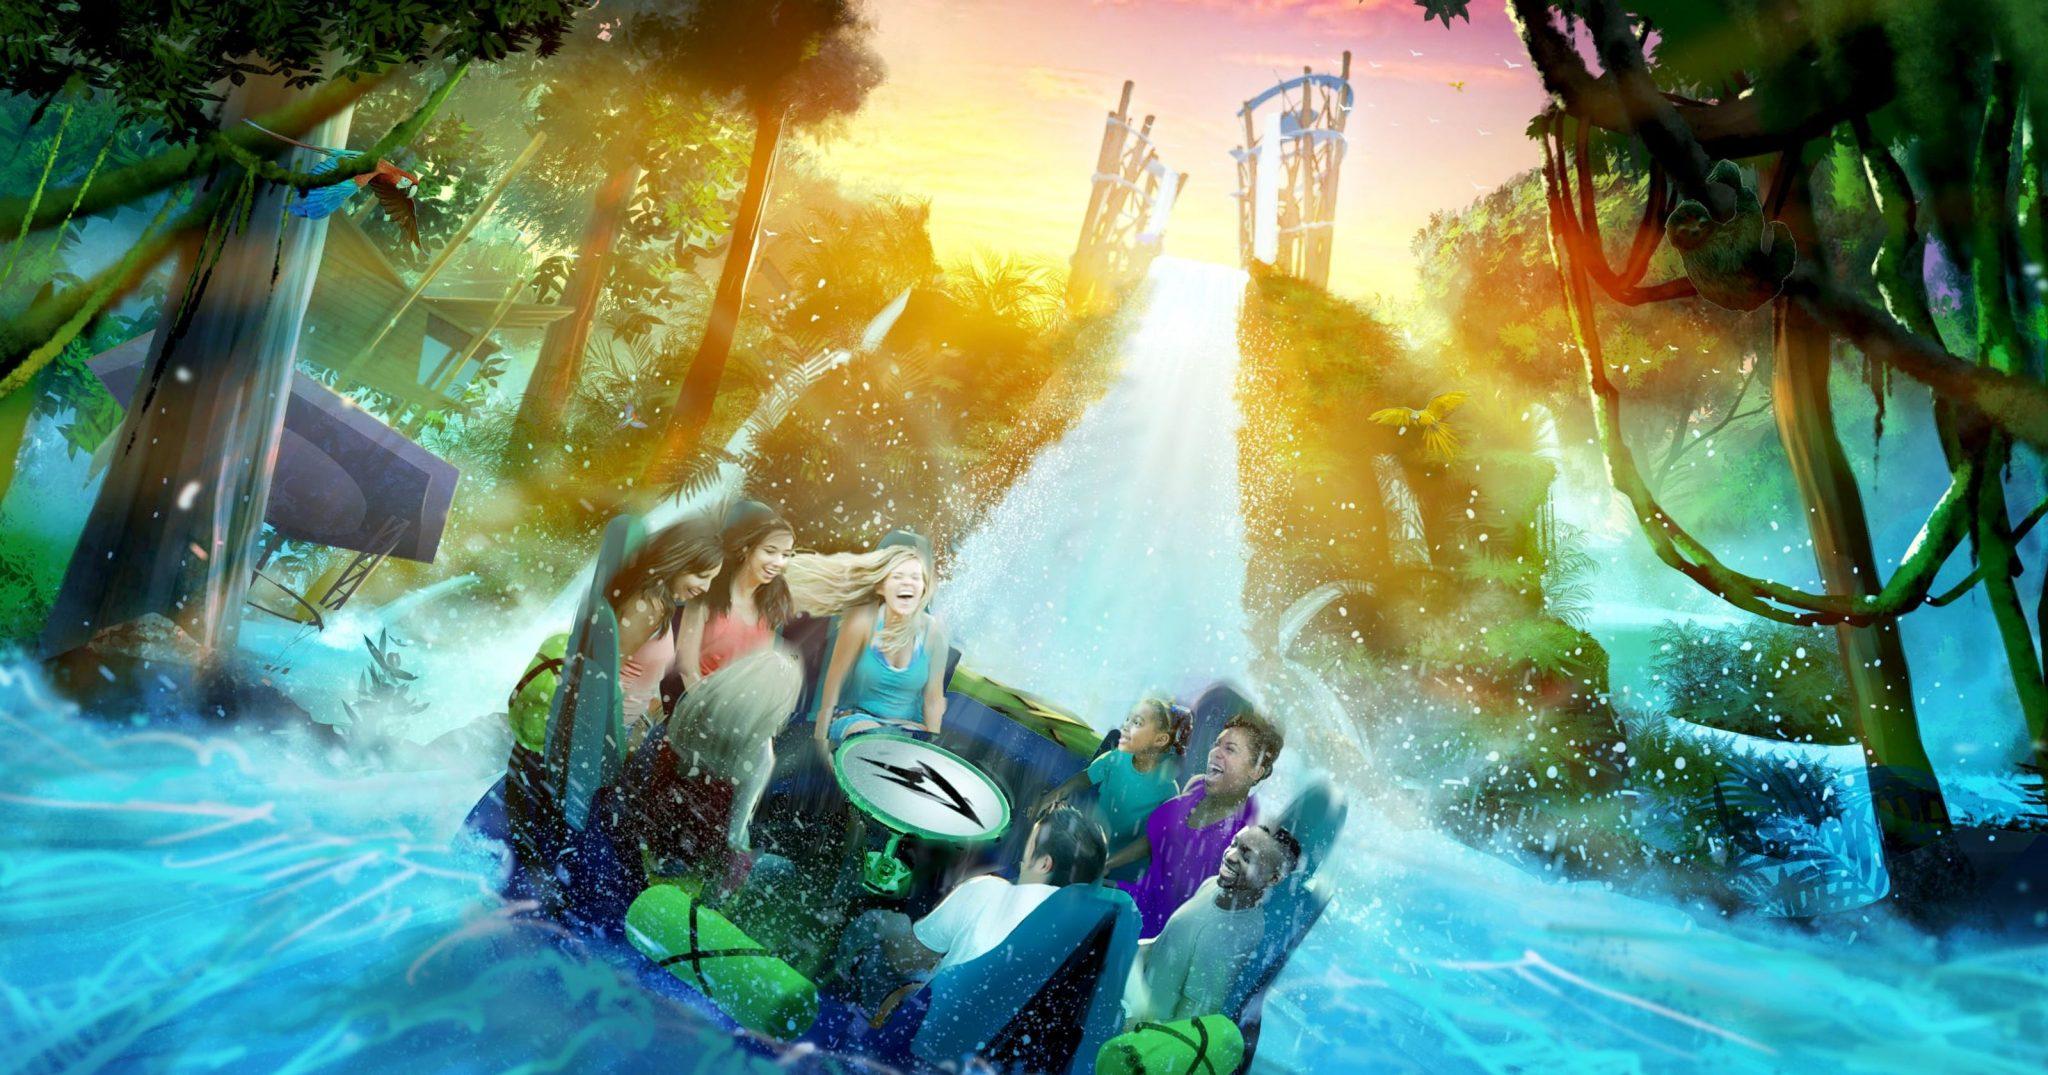 Ride Review: Infinity Falls at SeaWorld Orlando | World of